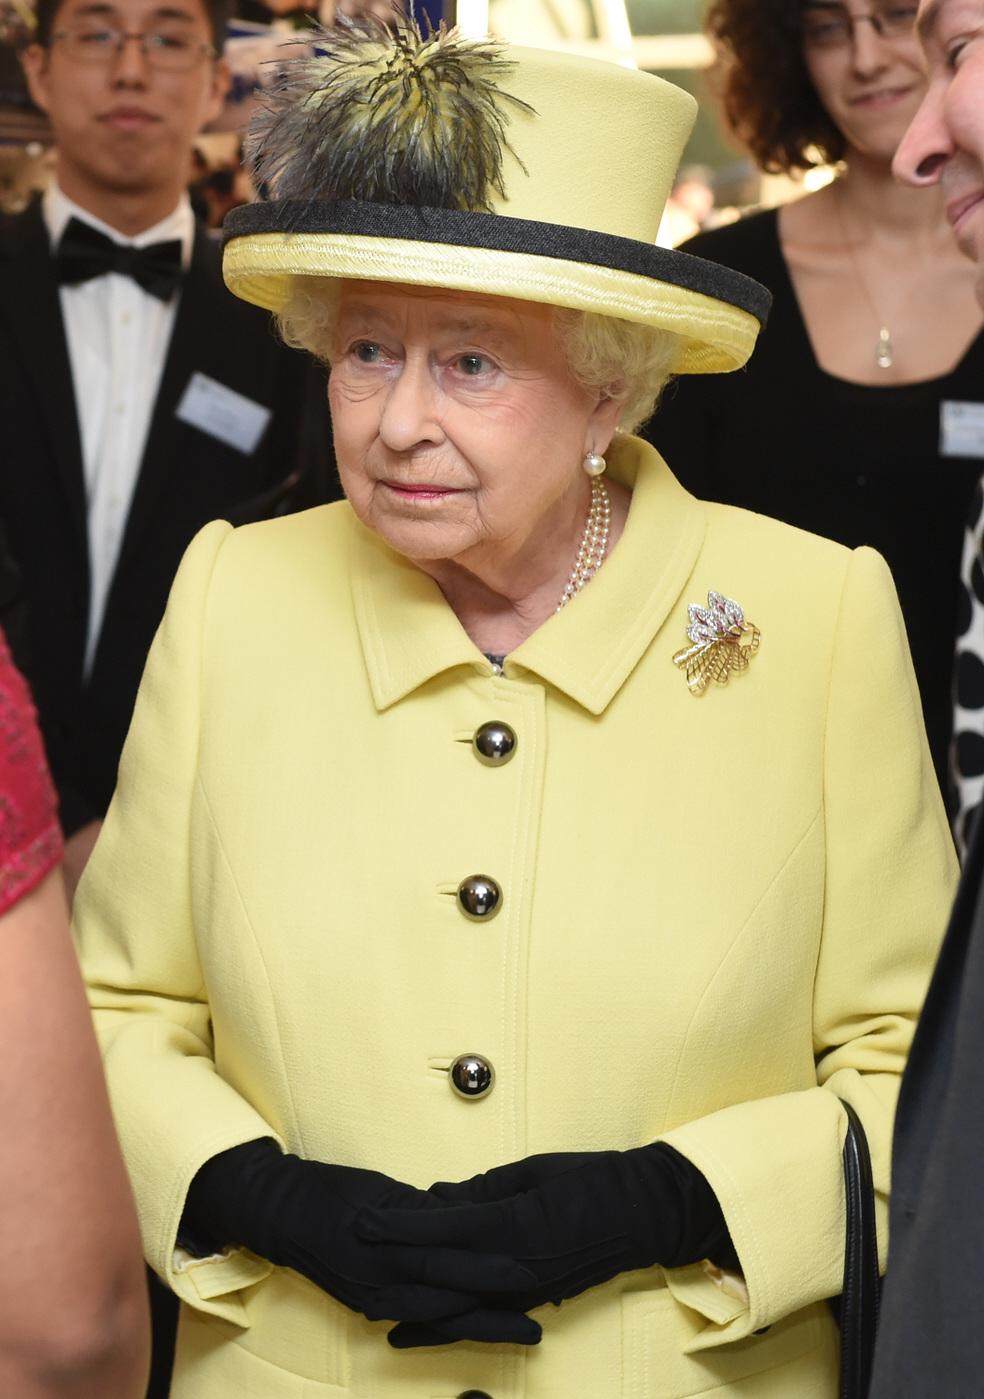 159866PCN_ElizabethIIPHT006  bitchy | Queen Elizabeth is 'up & about & working' behind closed doorways, so don't panic 159866PCN ElizabethIIPHT006